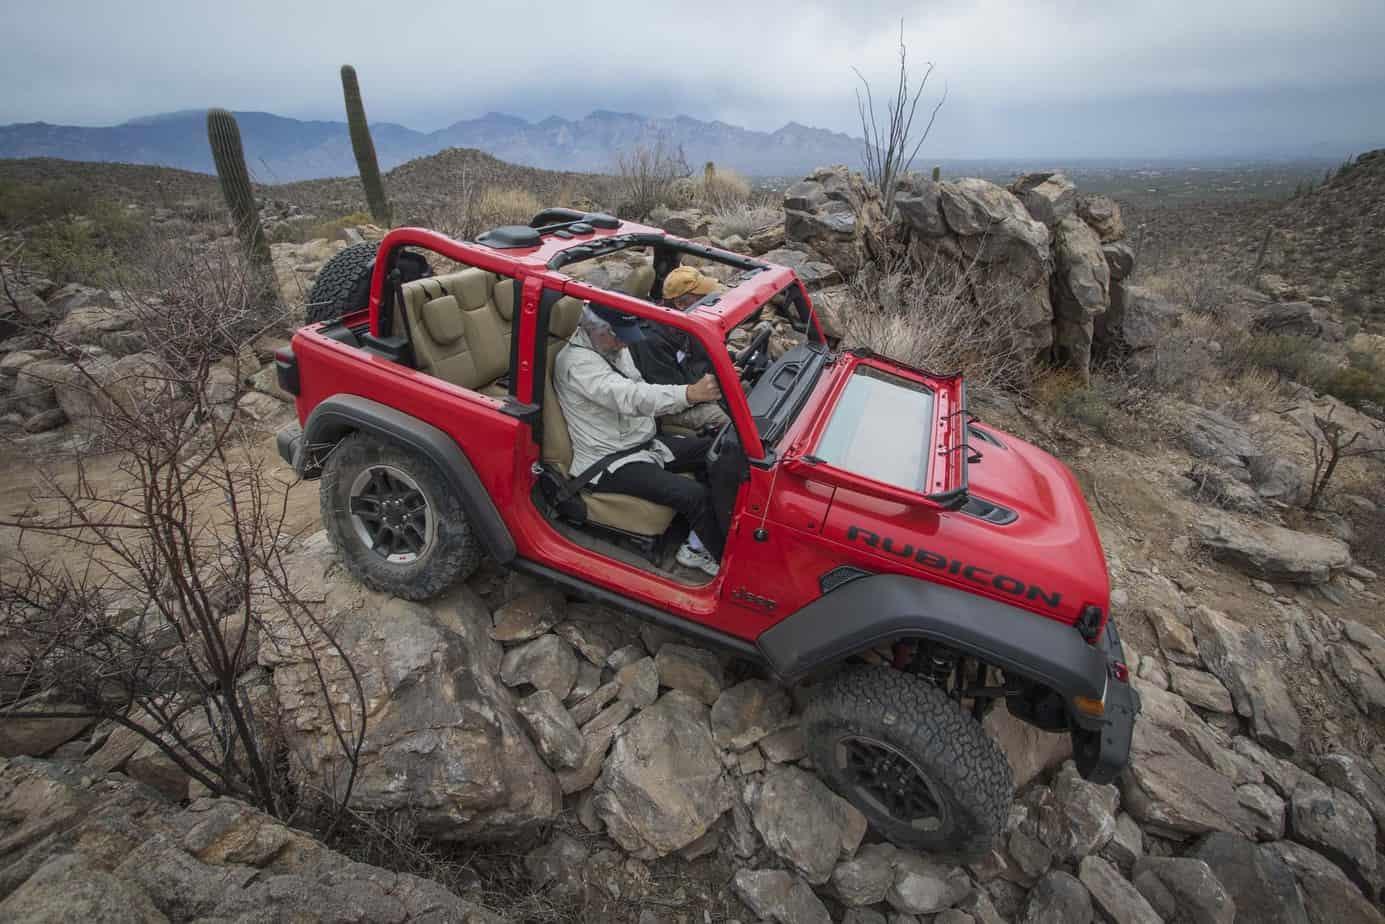 off road review 2018 jeep wrangler jl expedition portal. Black Bedroom Furniture Sets. Home Design Ideas